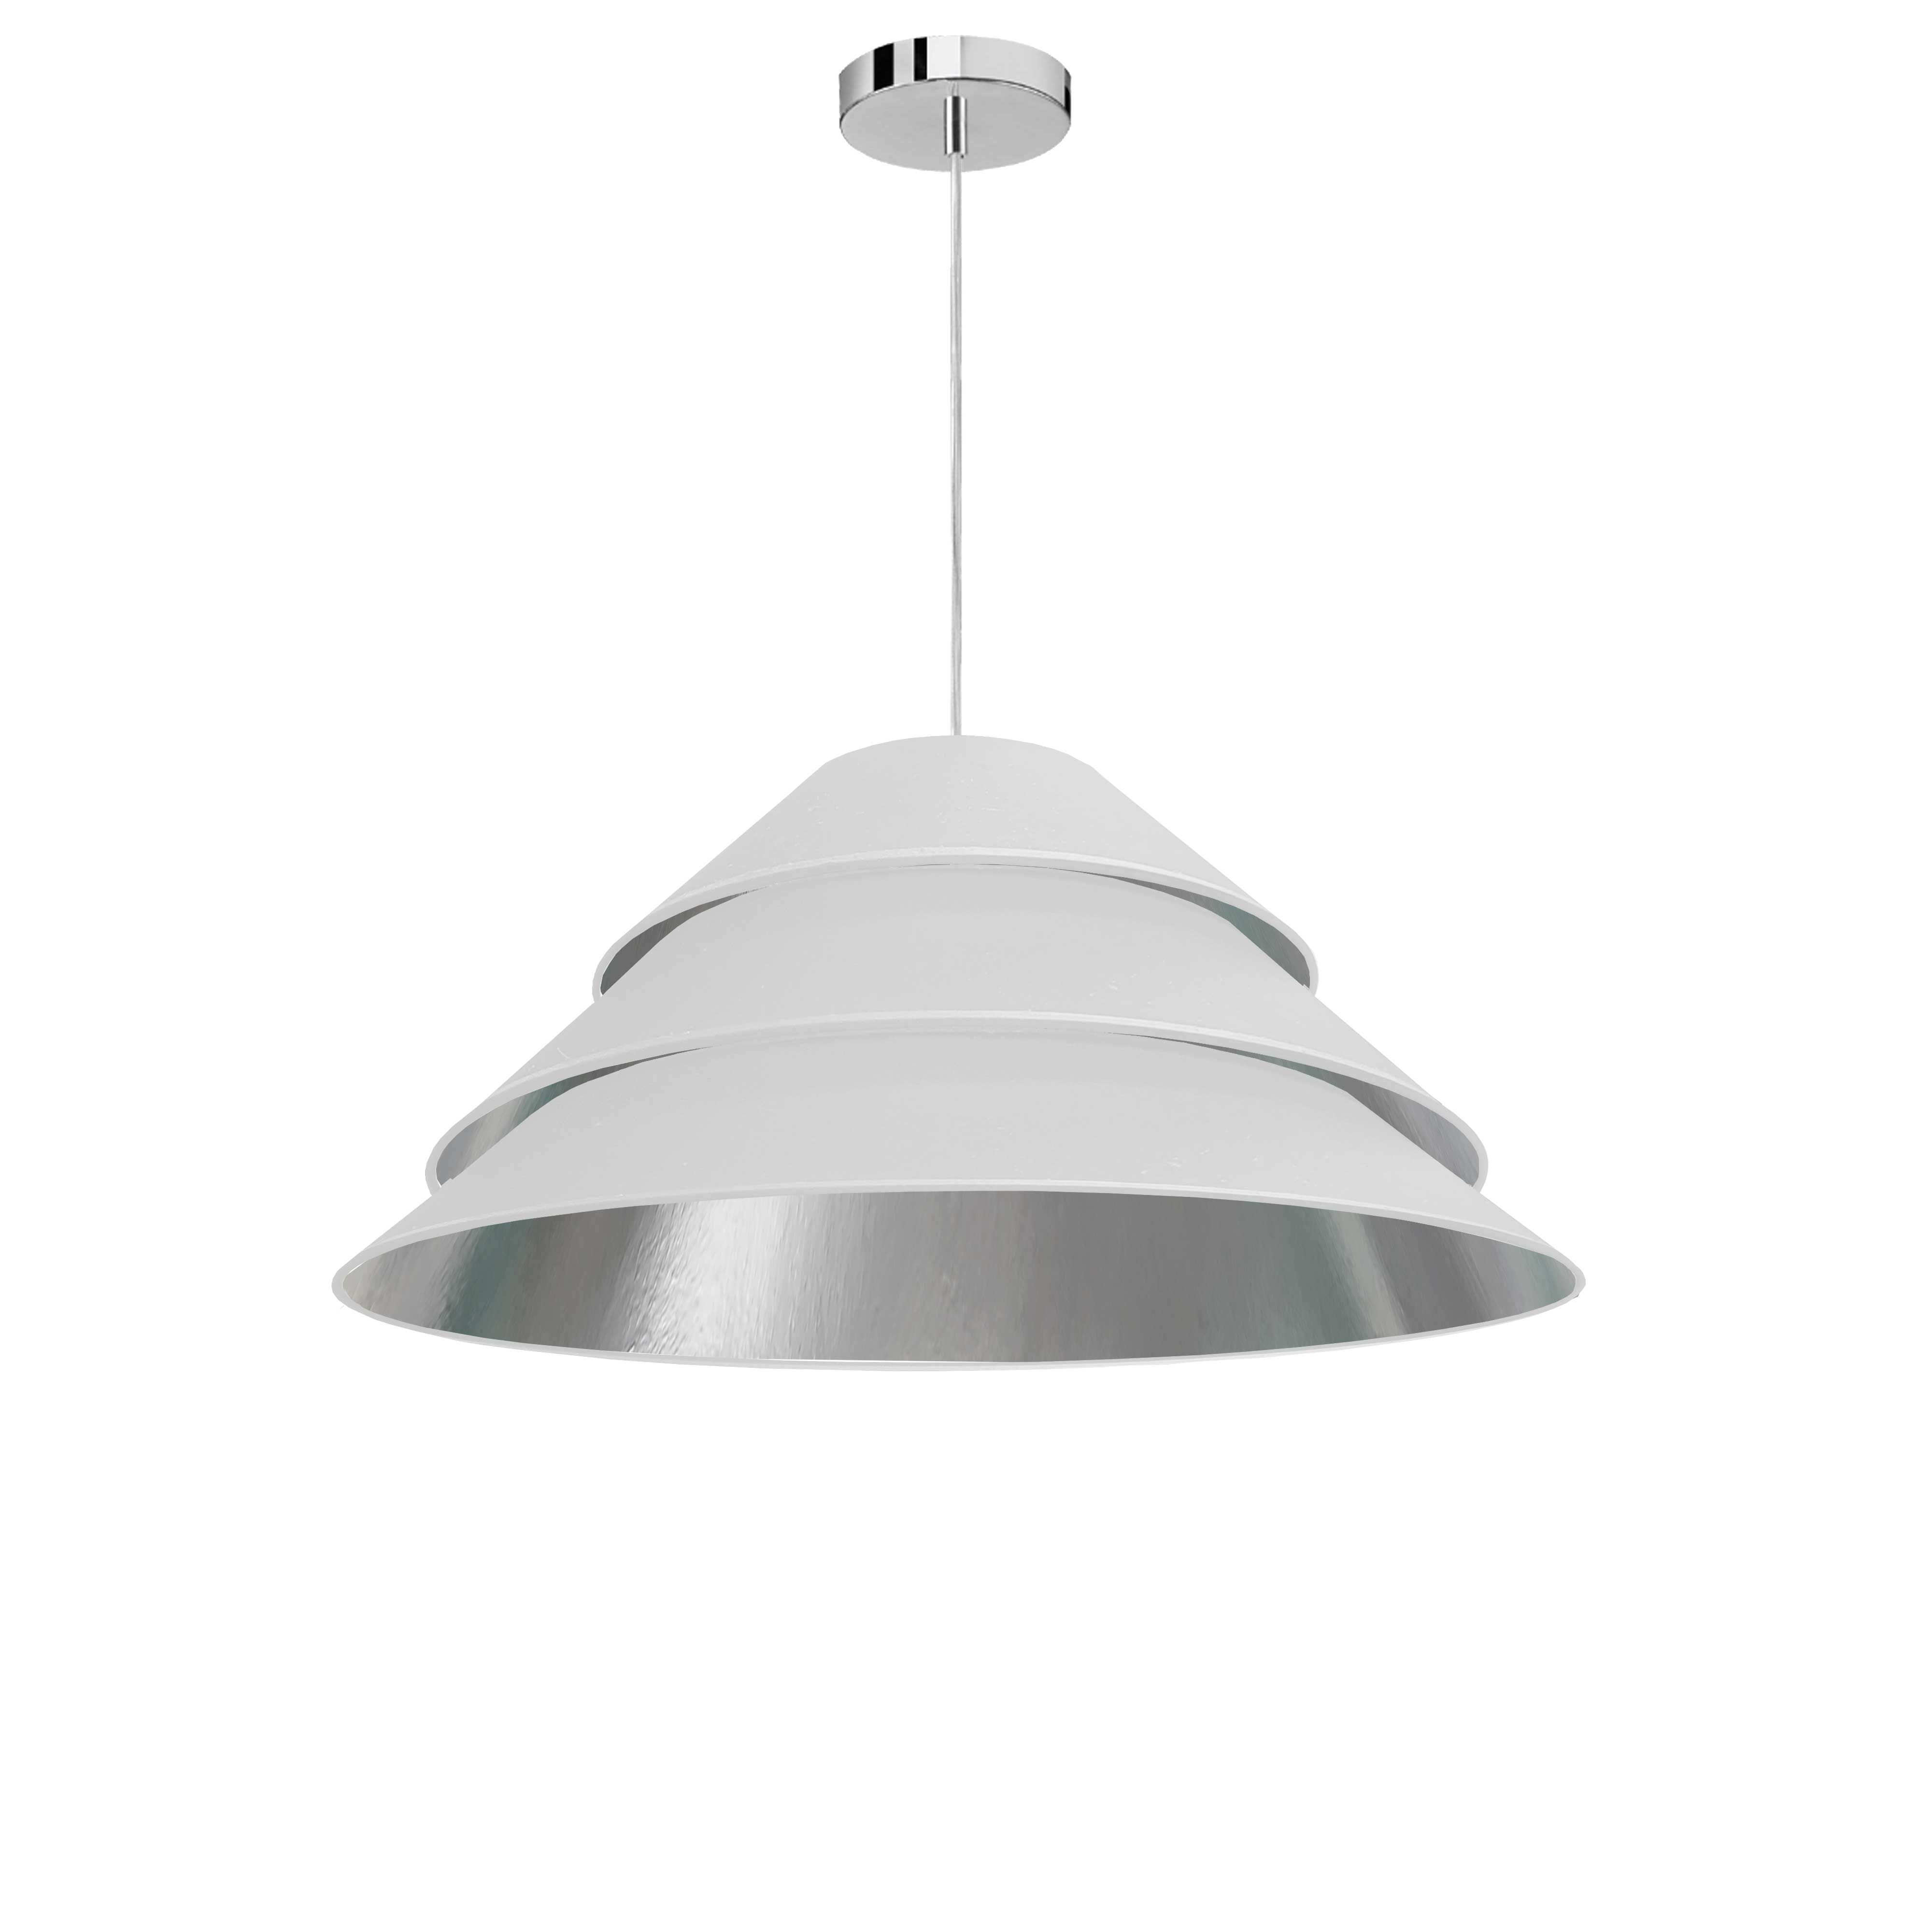 1Light Aranza Pendant, White/Silver Shade, Polished Chrome